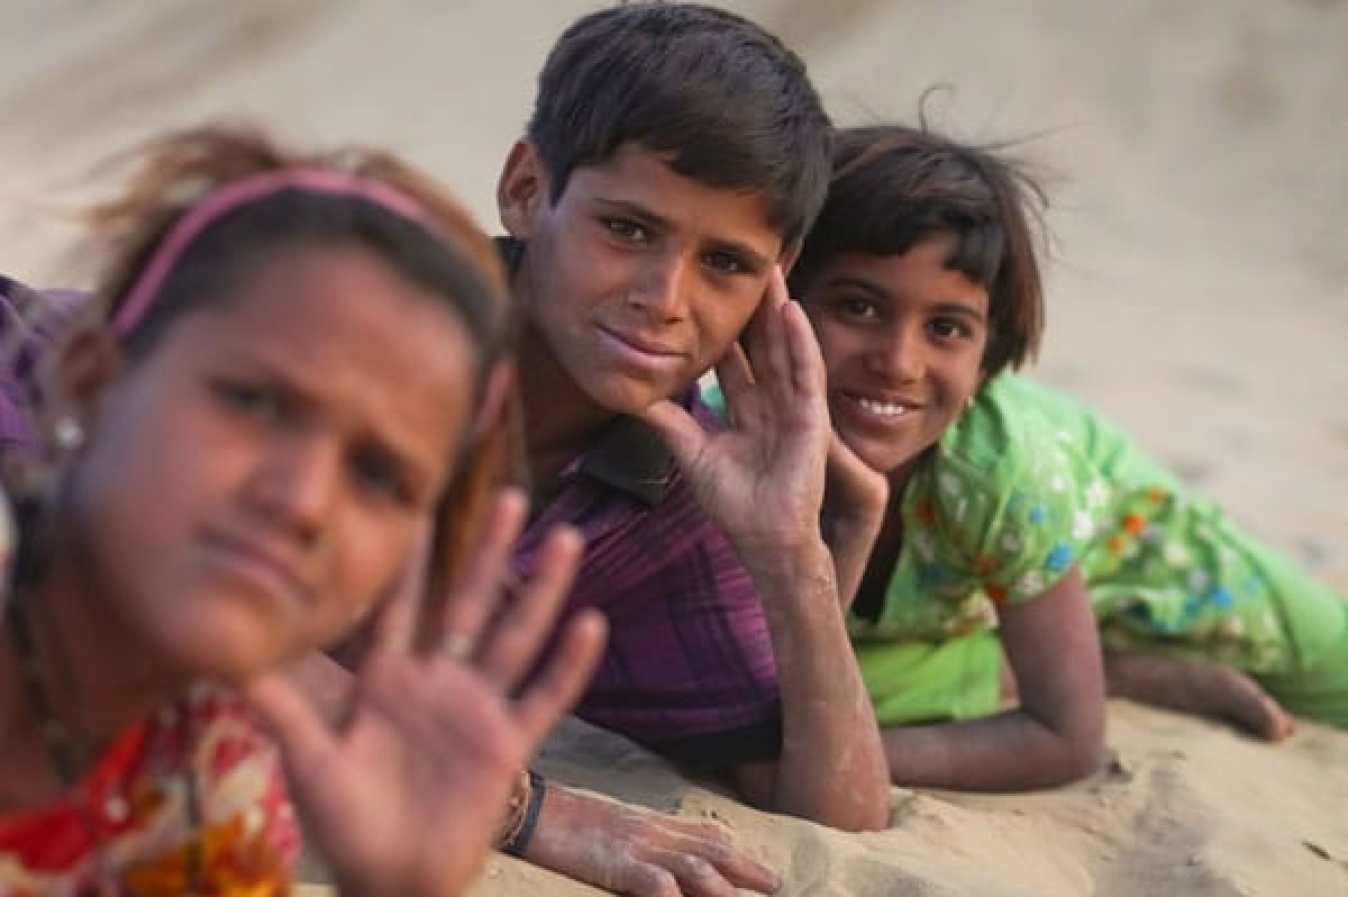 Indian children concept.